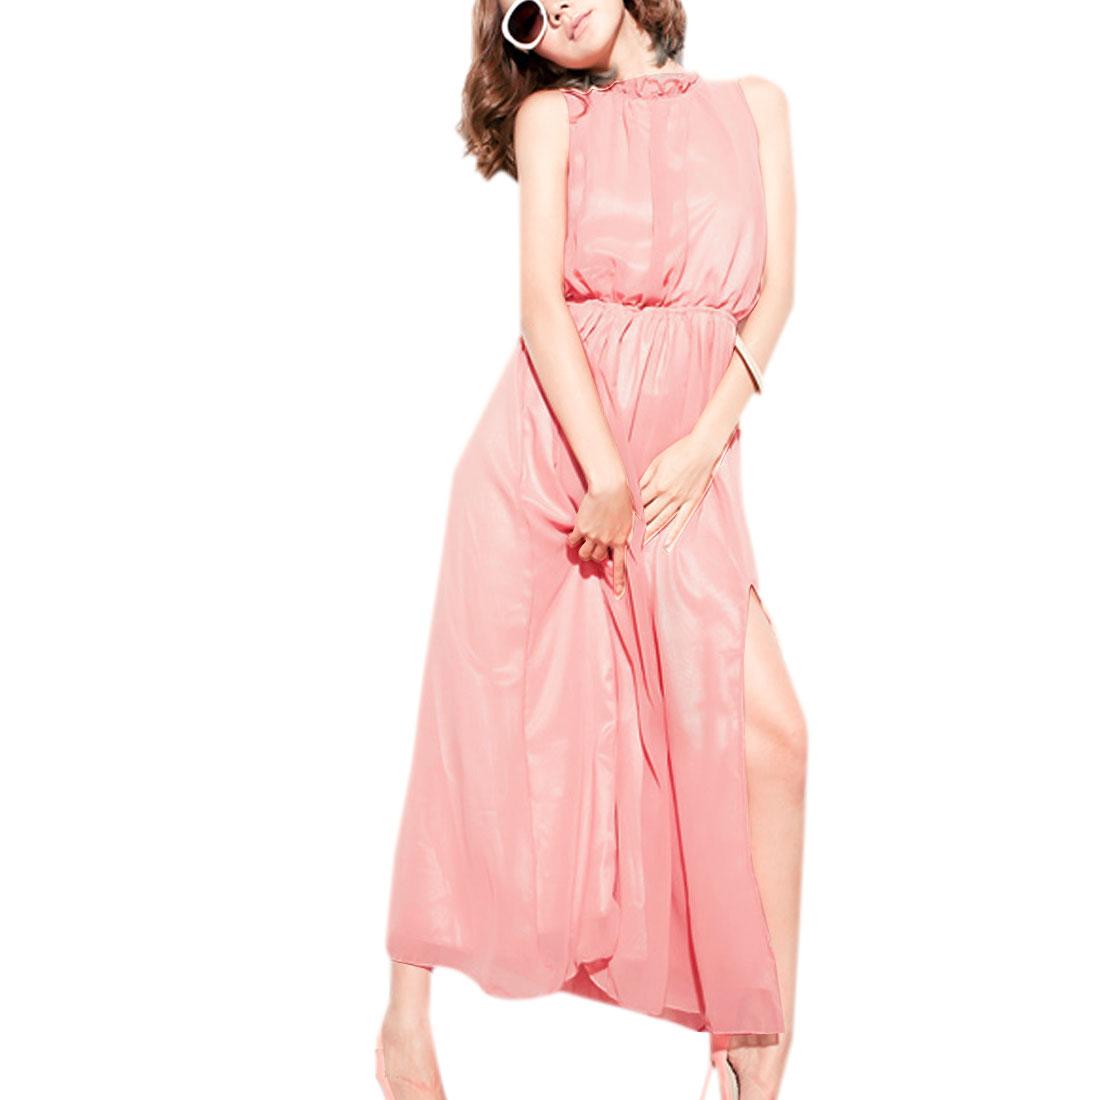 Ladies Pink Elastic Waist Sleeveless Self Tie Halter Split Sides Lining Dress S